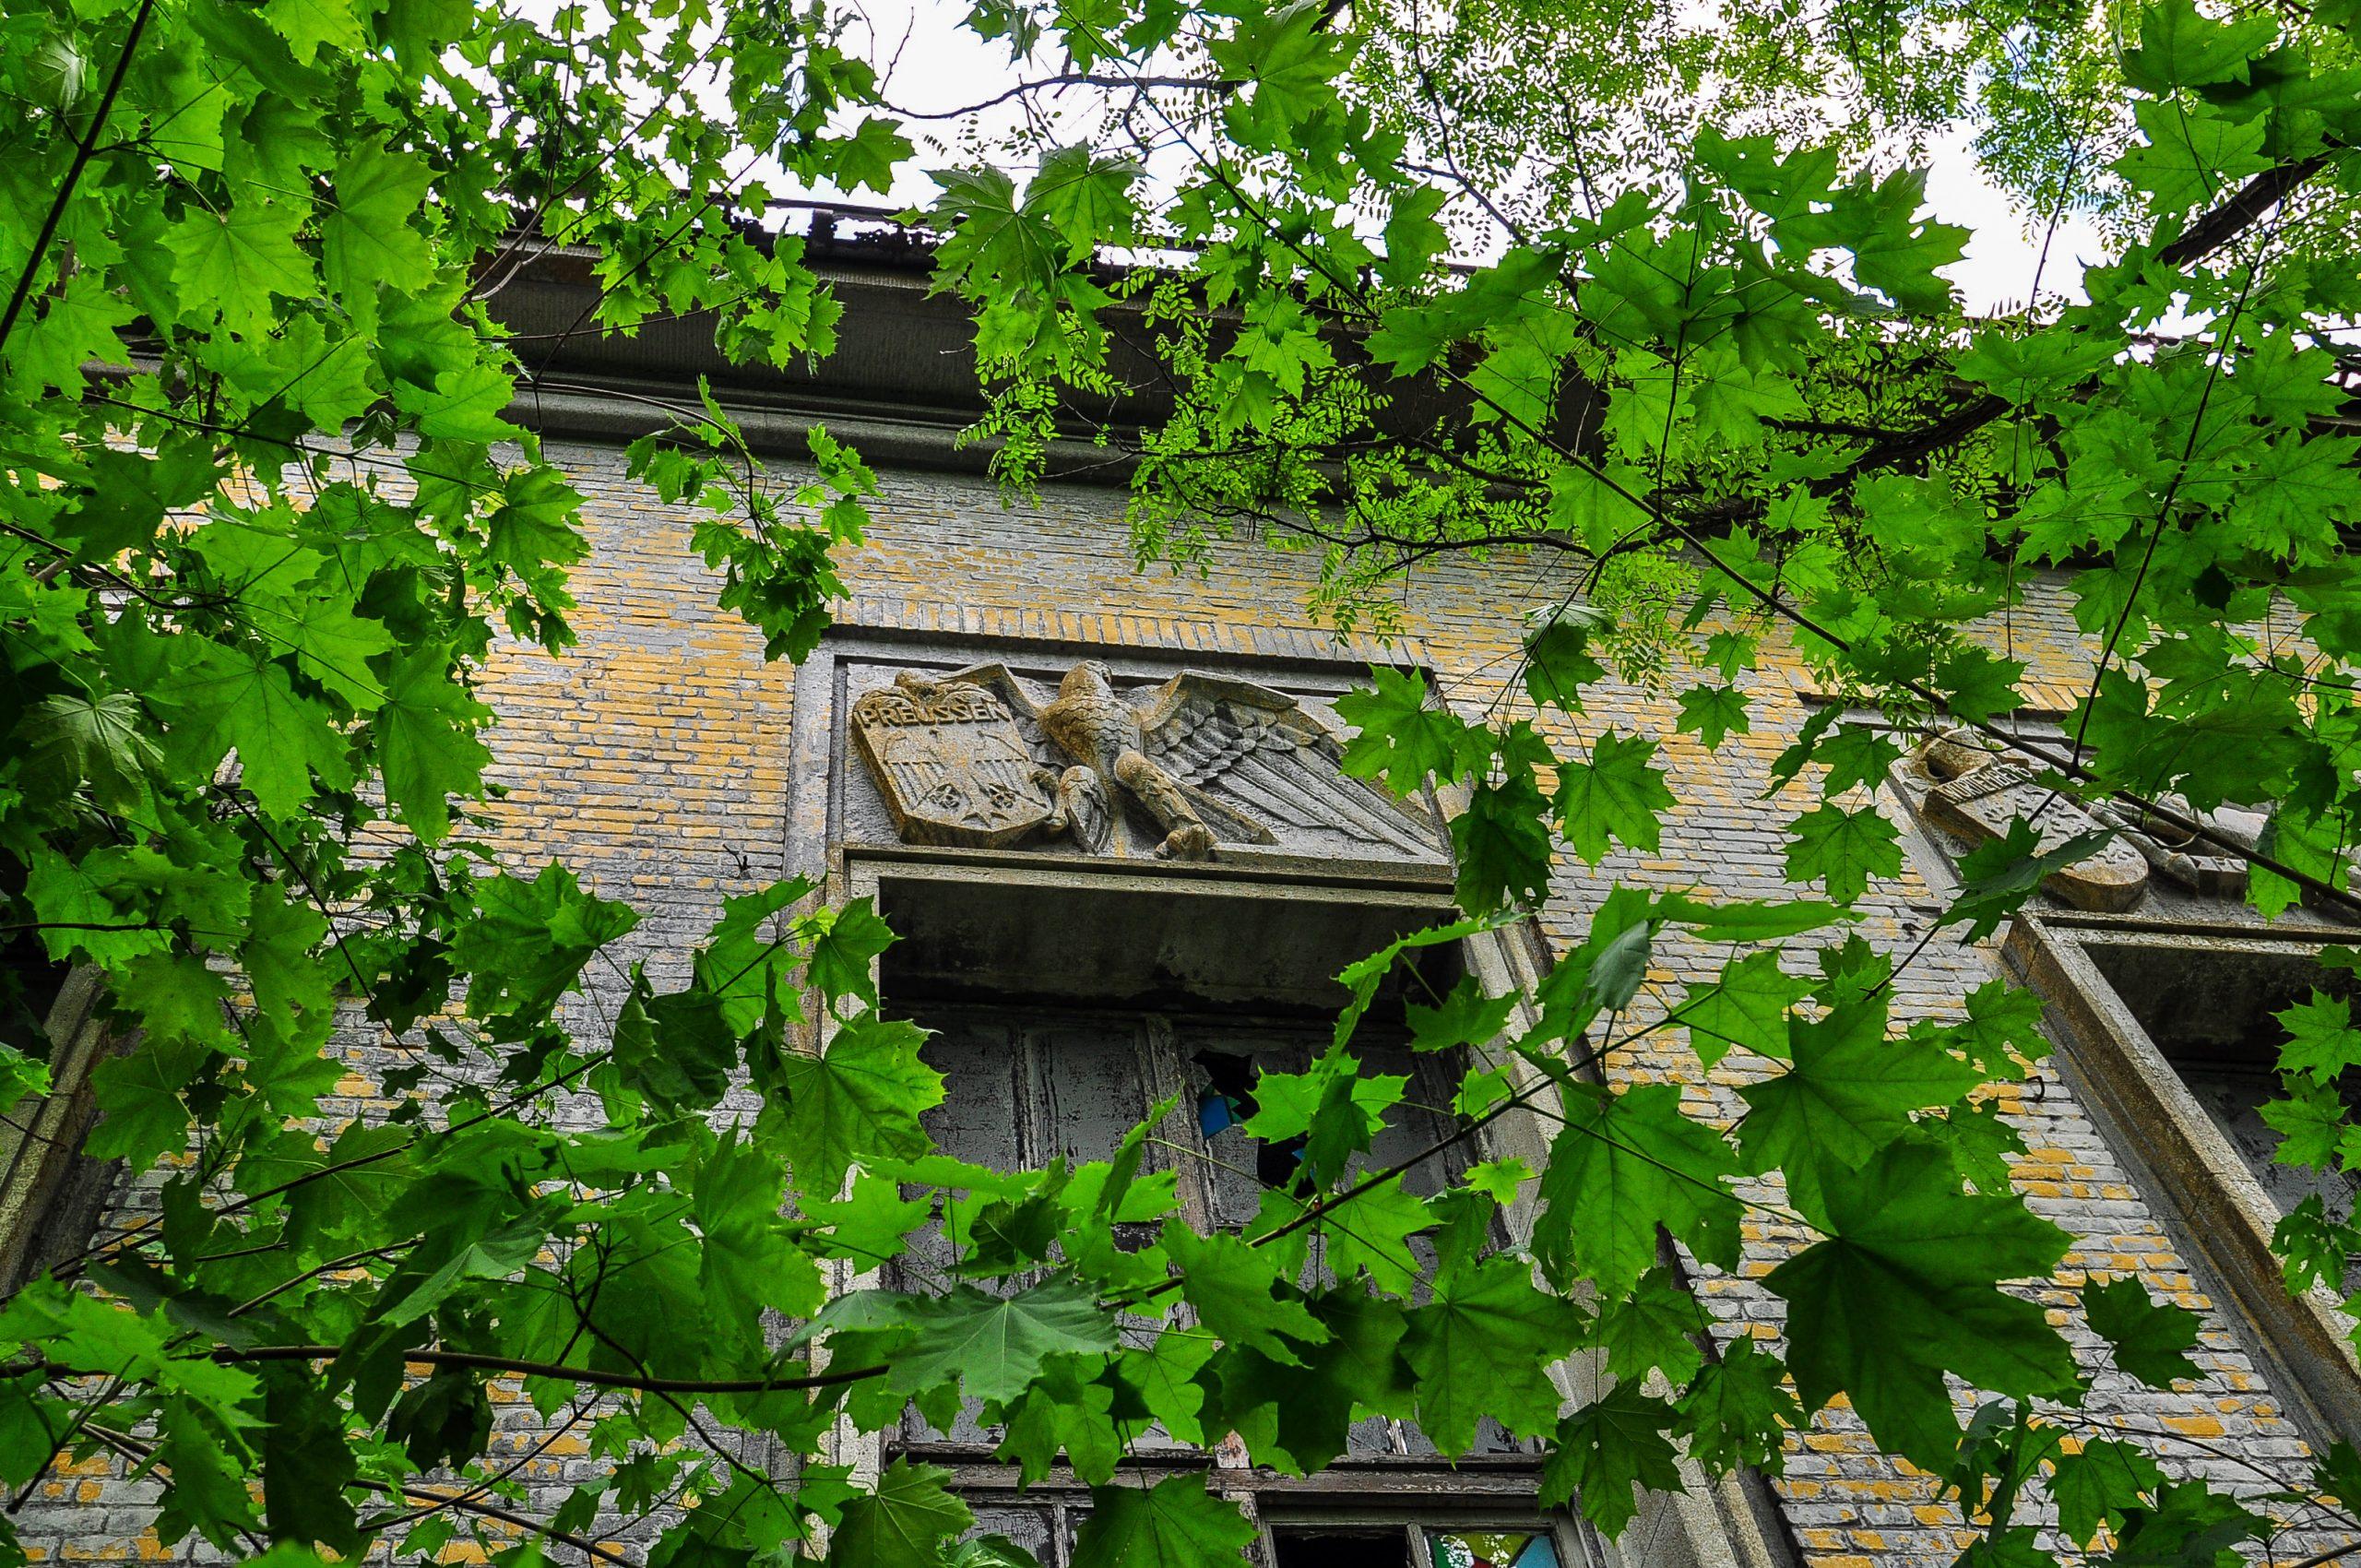 nazi eagle prussia state emblem kaserne krampnitz abandoned potsdam berlin Kavallerieschule barracks Panzertruppenschule nazi soviet military base germany deutschland